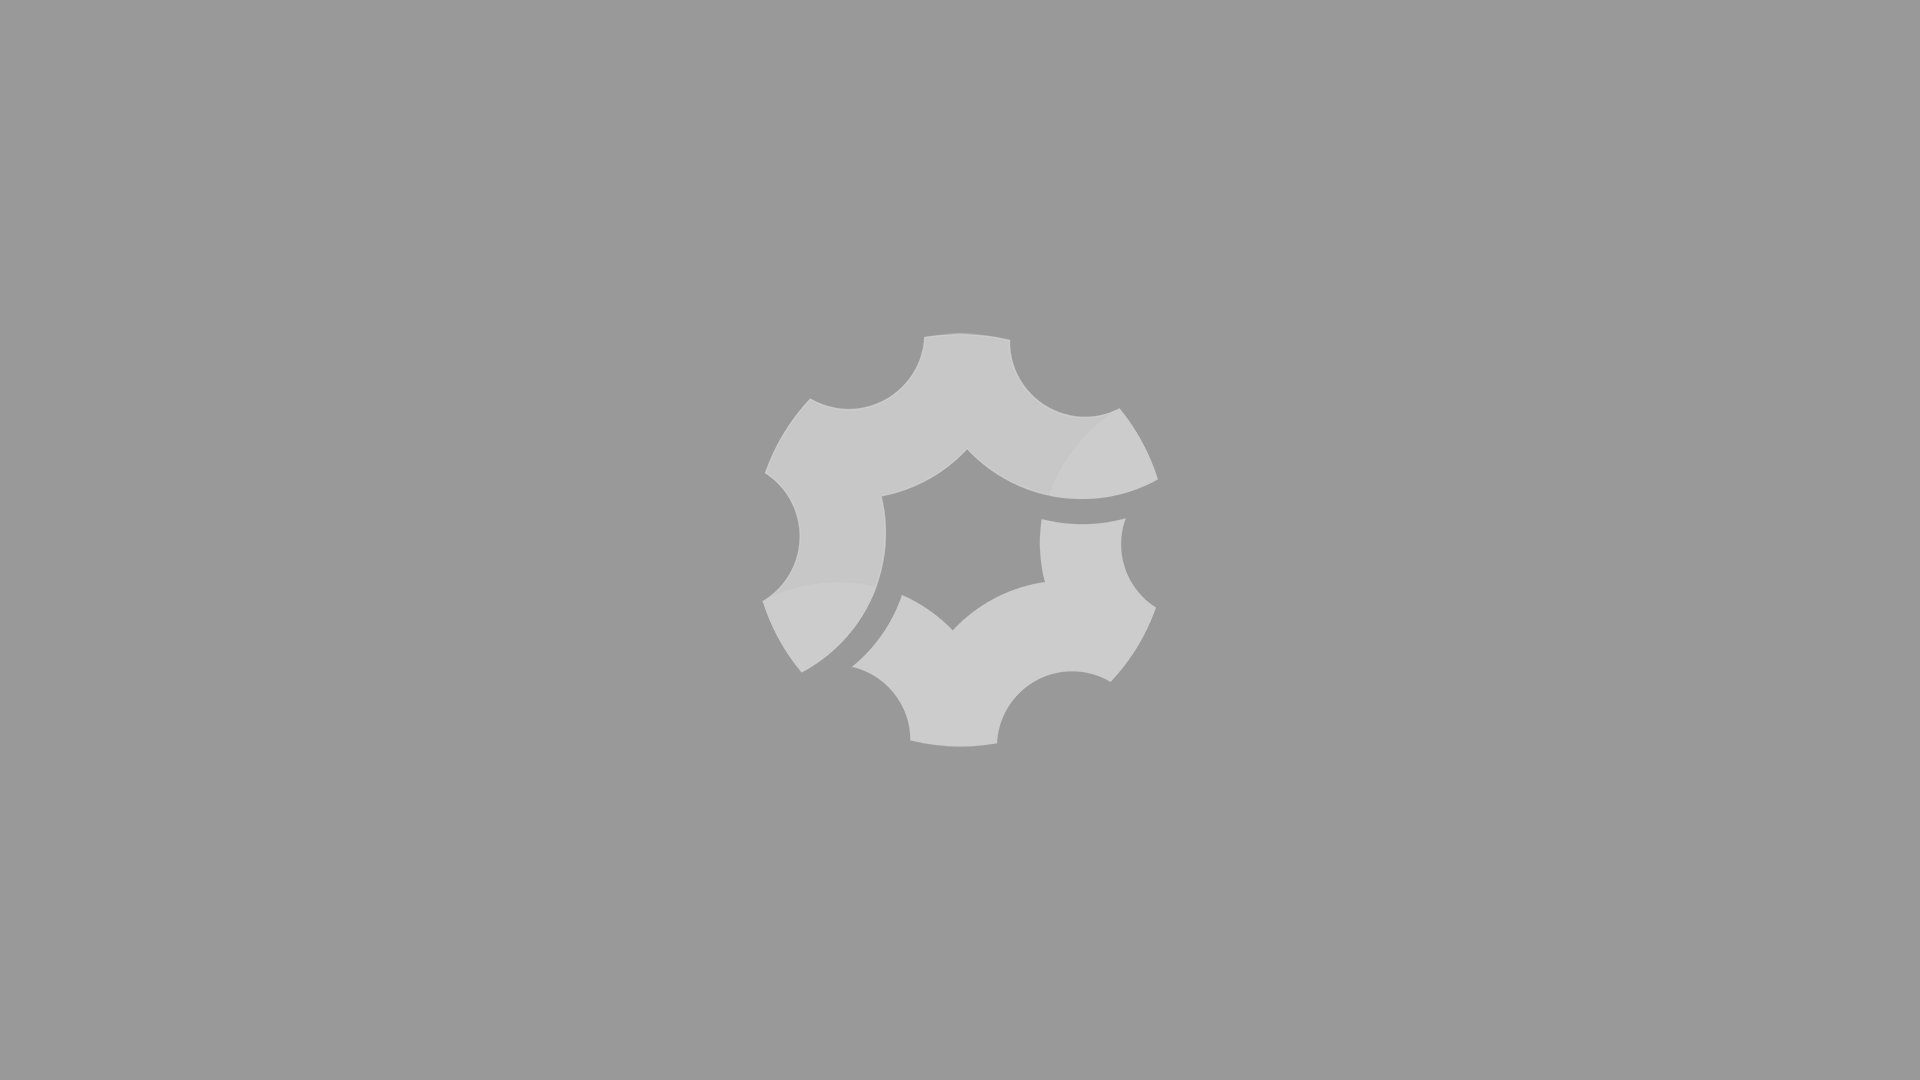 LowLife x 1954 x Hoodlum - The Amazing RedGouf